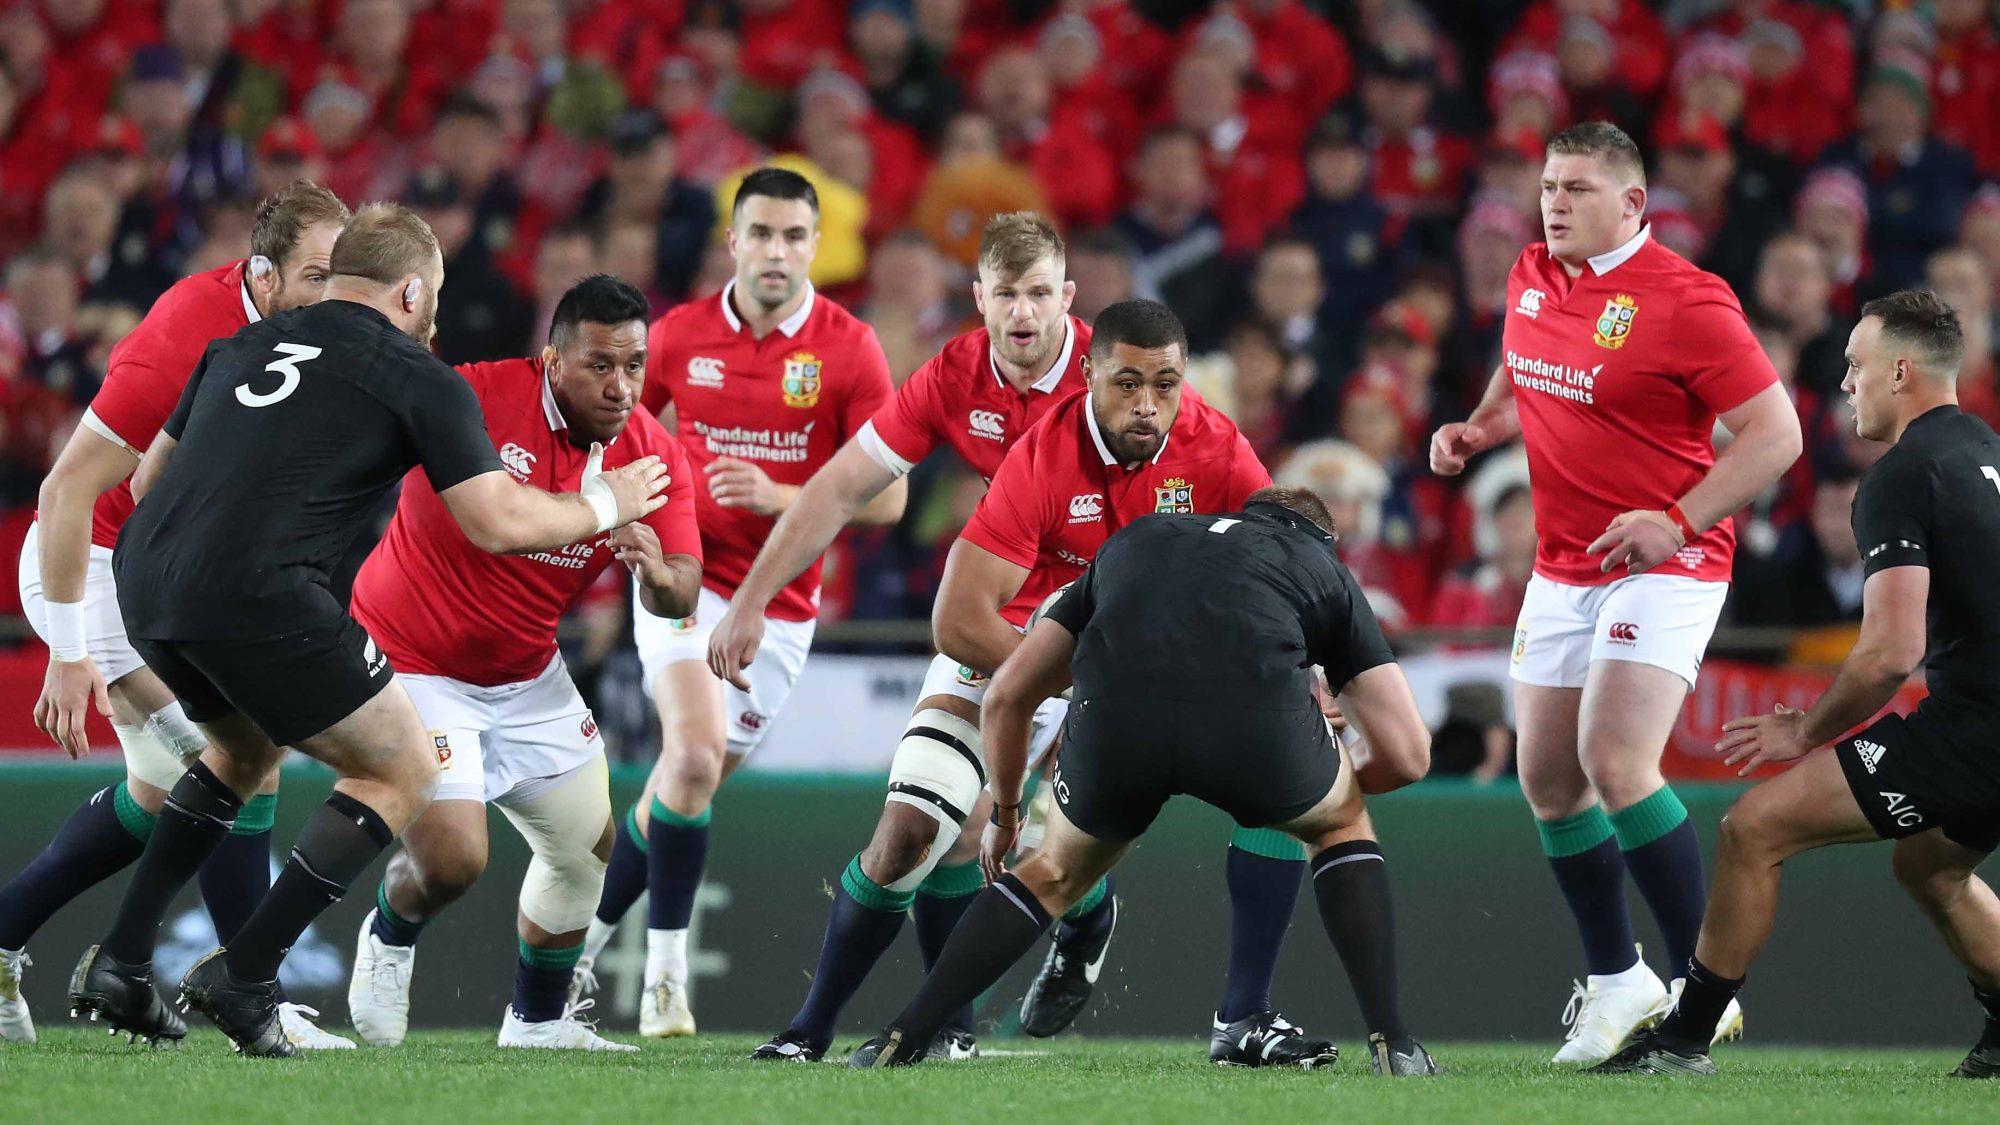 Lions belief will not falter – Faletau